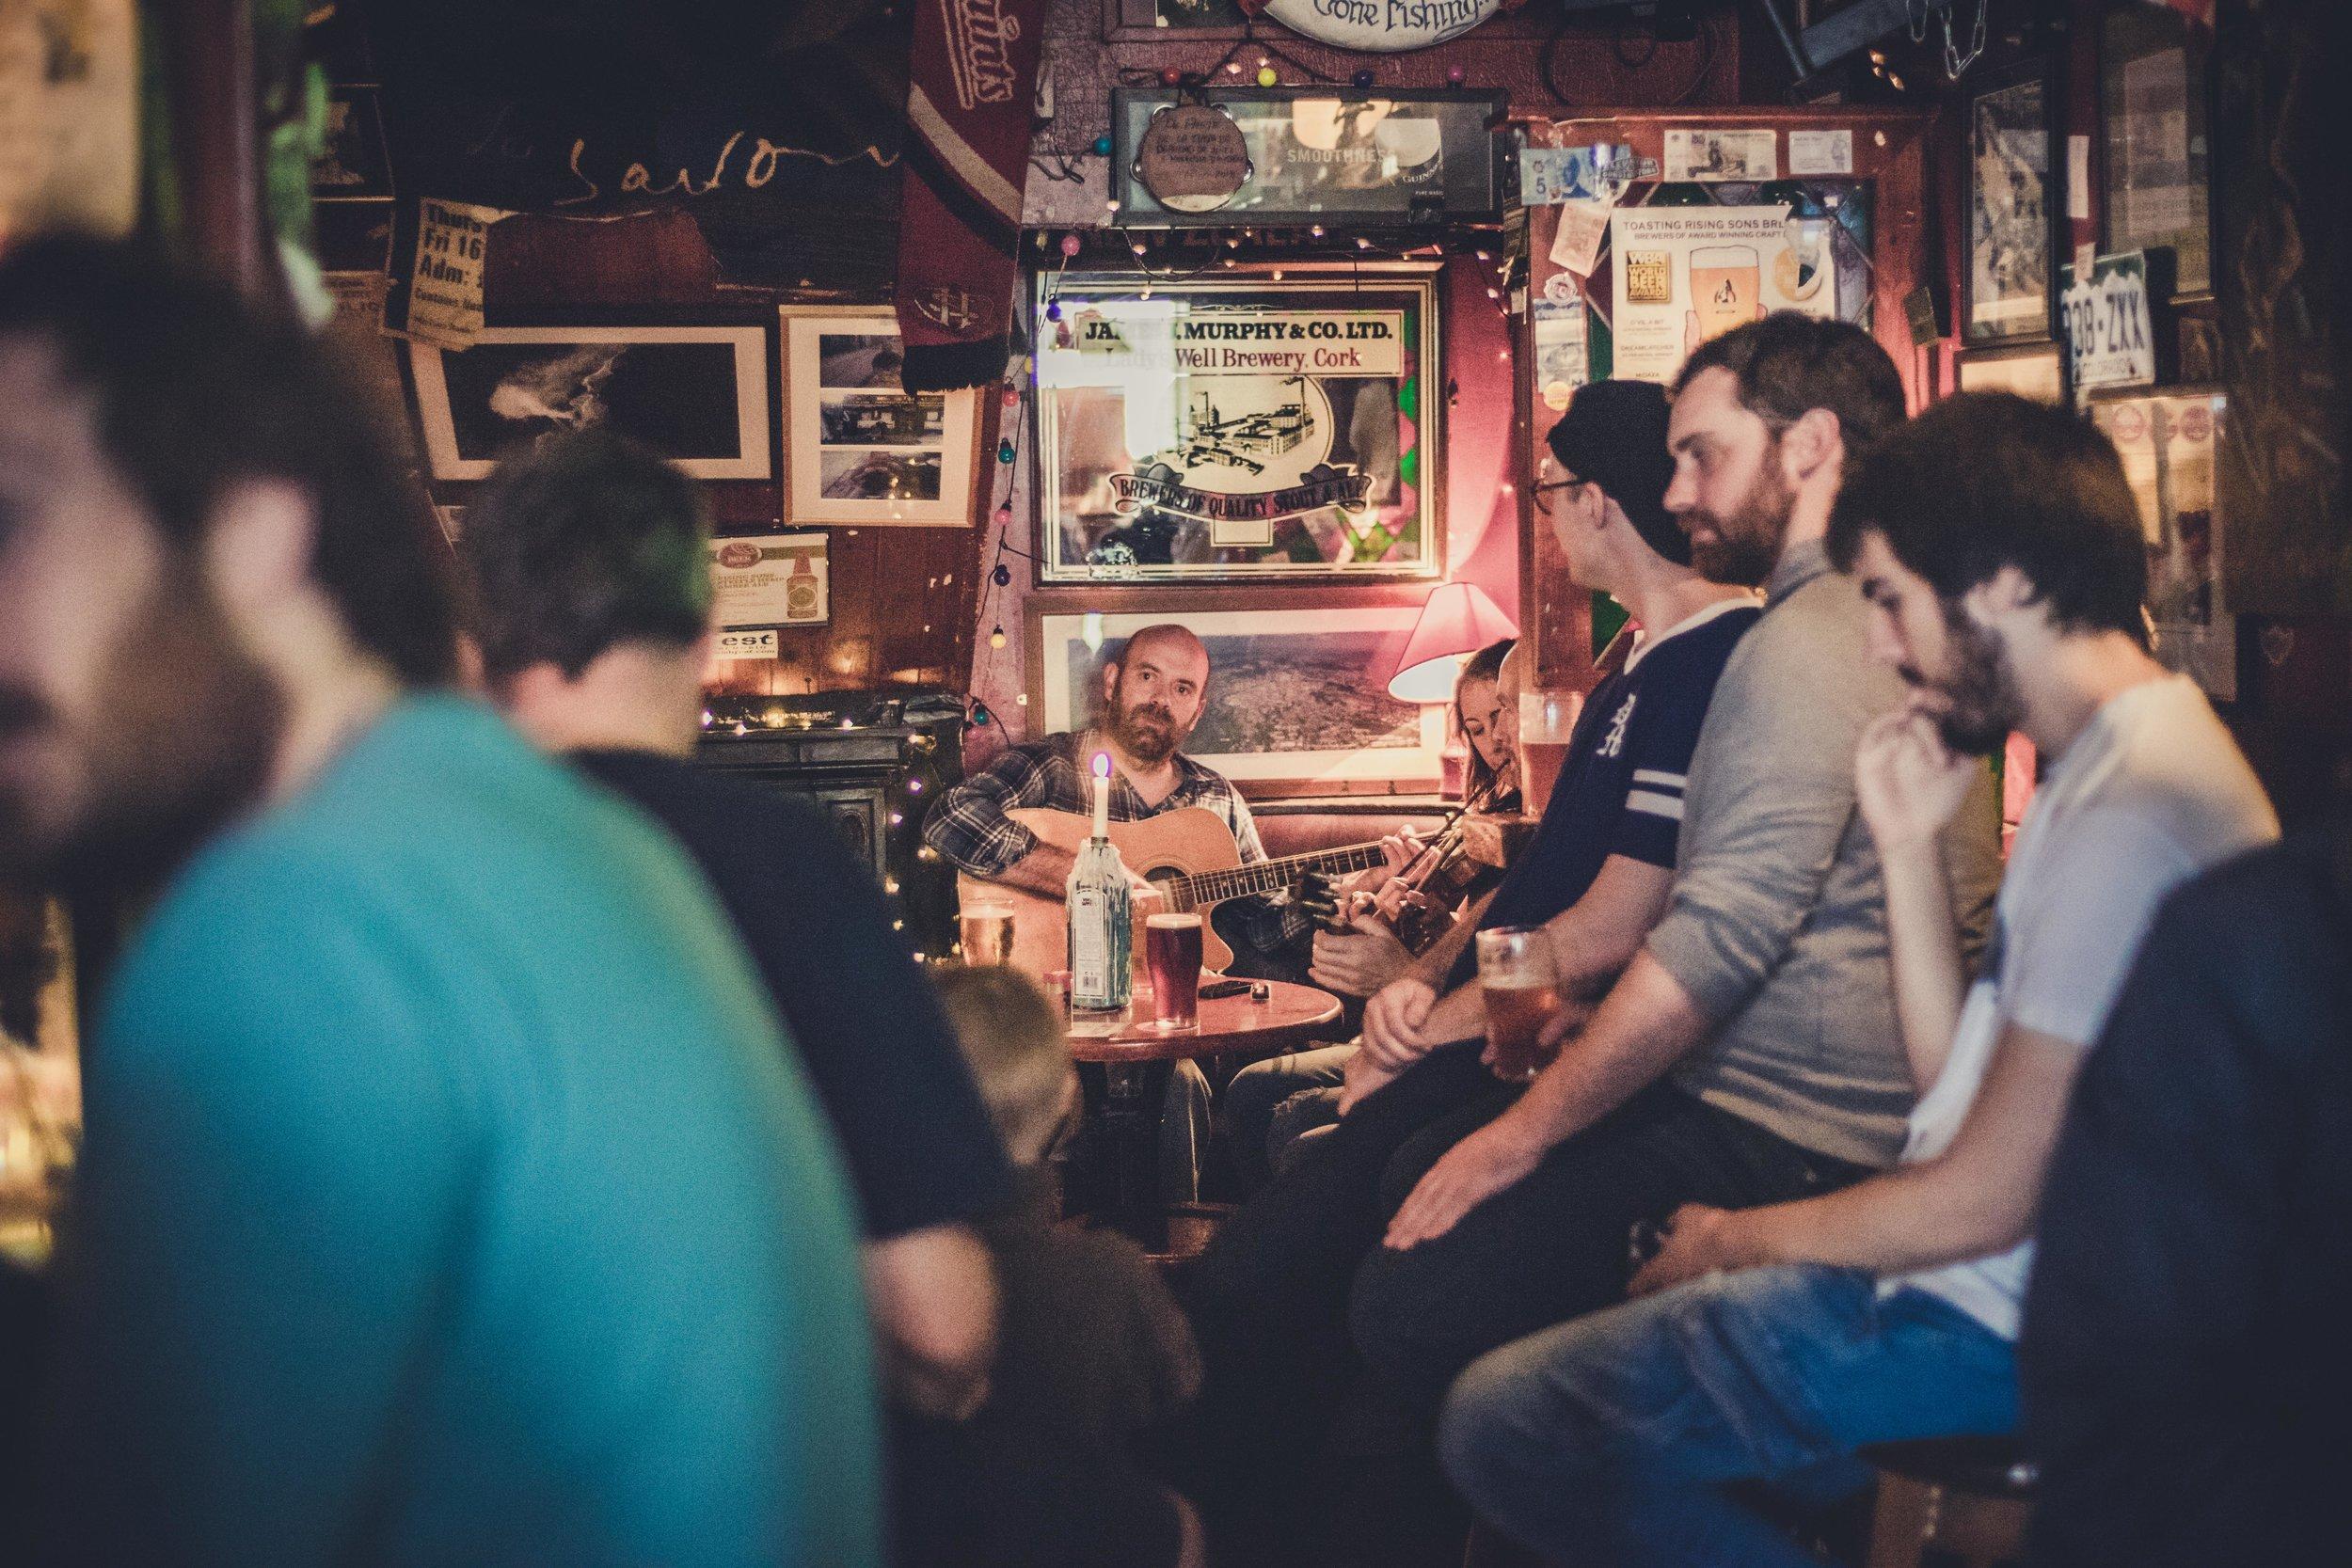 county cork. cork. ireland. irish. history. city. house sitting. old. travel. travel photography. travel photographer. lough hyne. hiking. outdoor. adventure. music in the pub. irish trad music.jpg